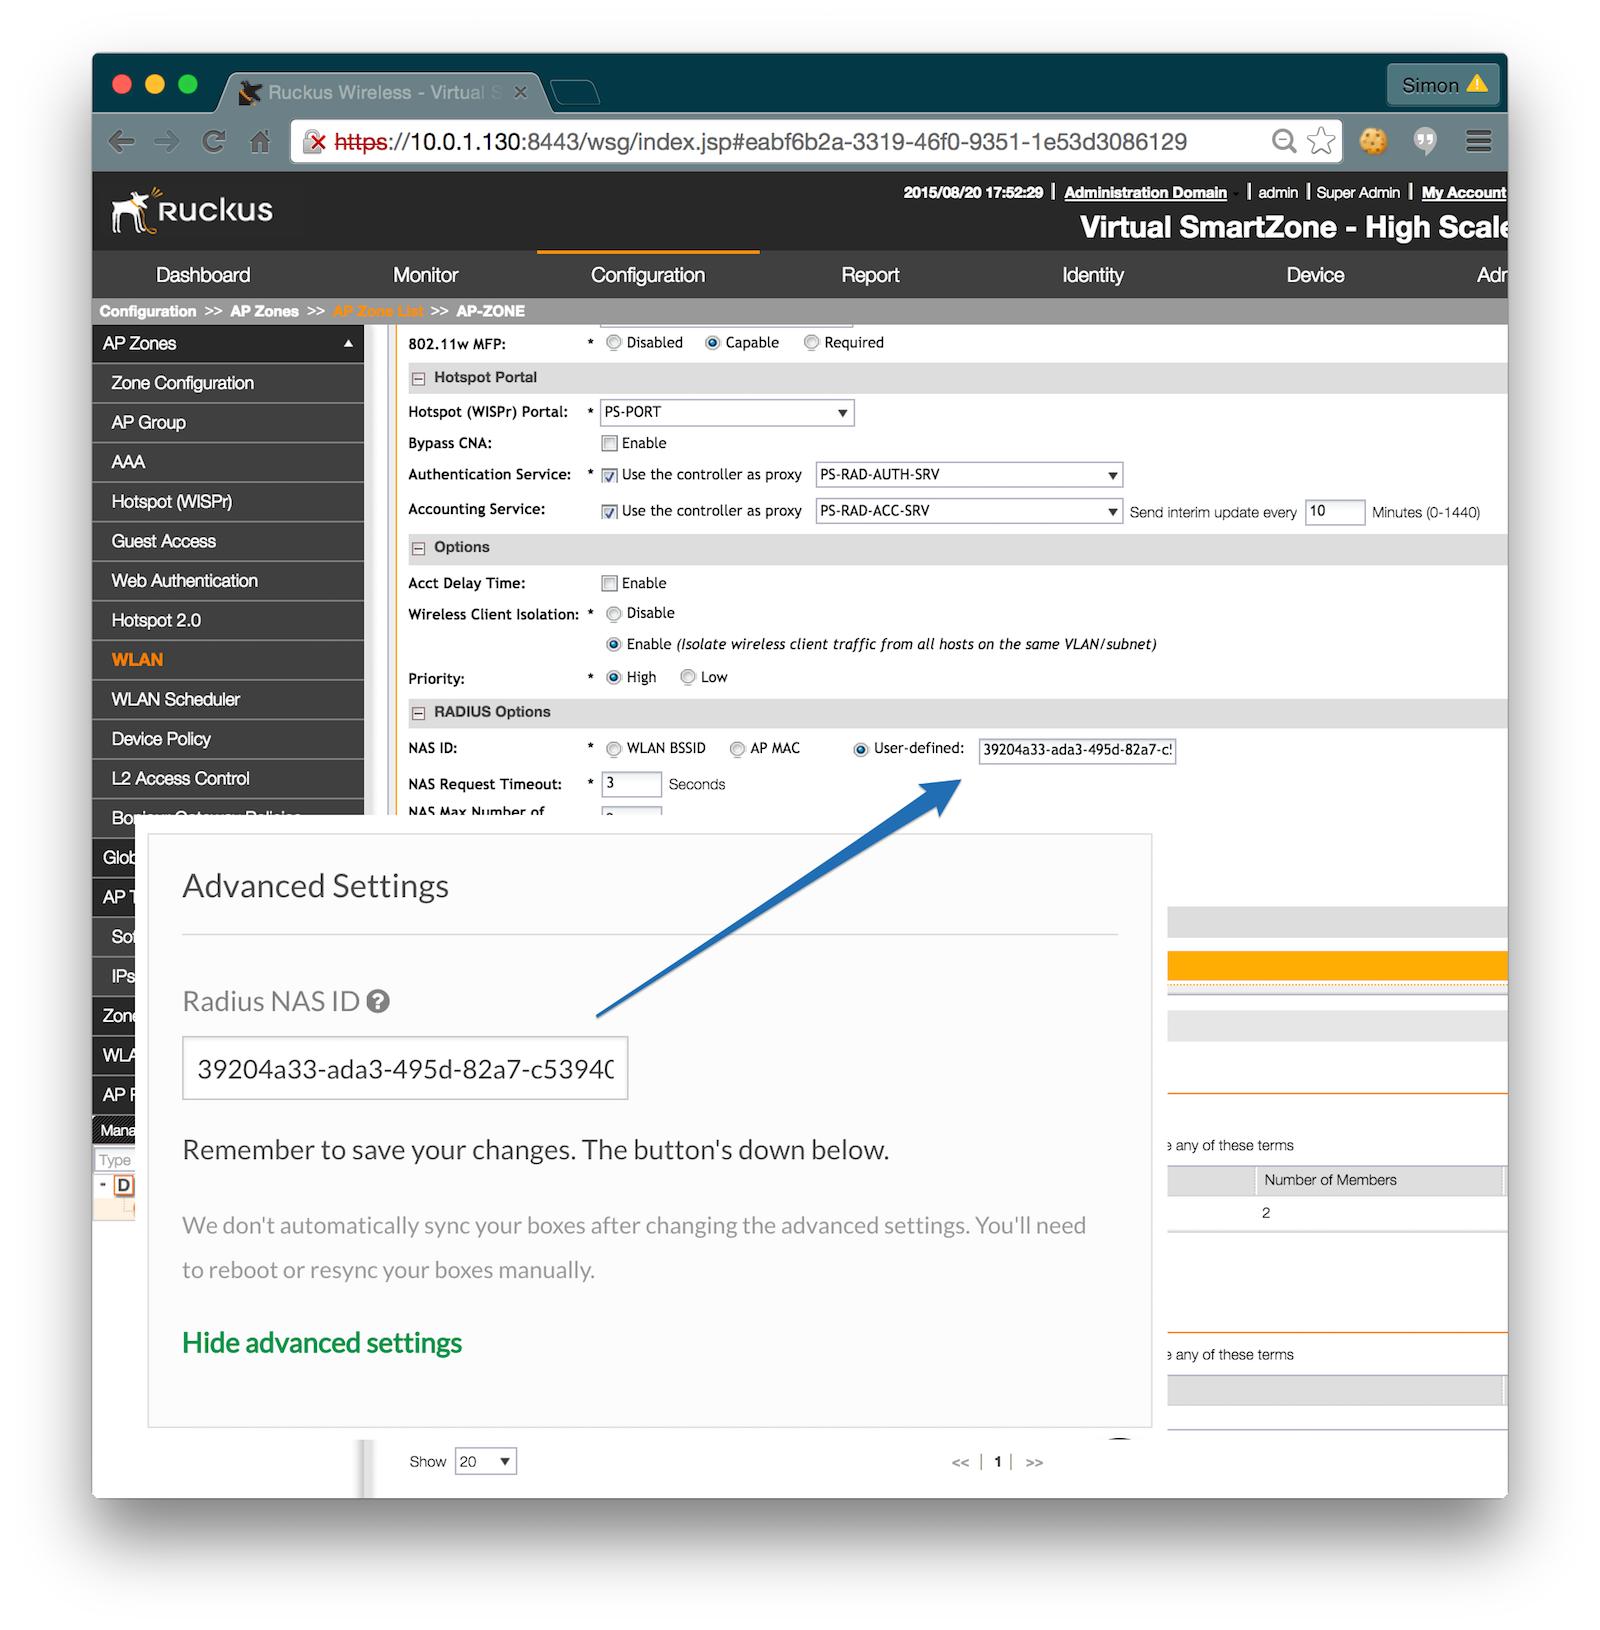 Ruckus Virtual SmartZone Captive Portal Integration